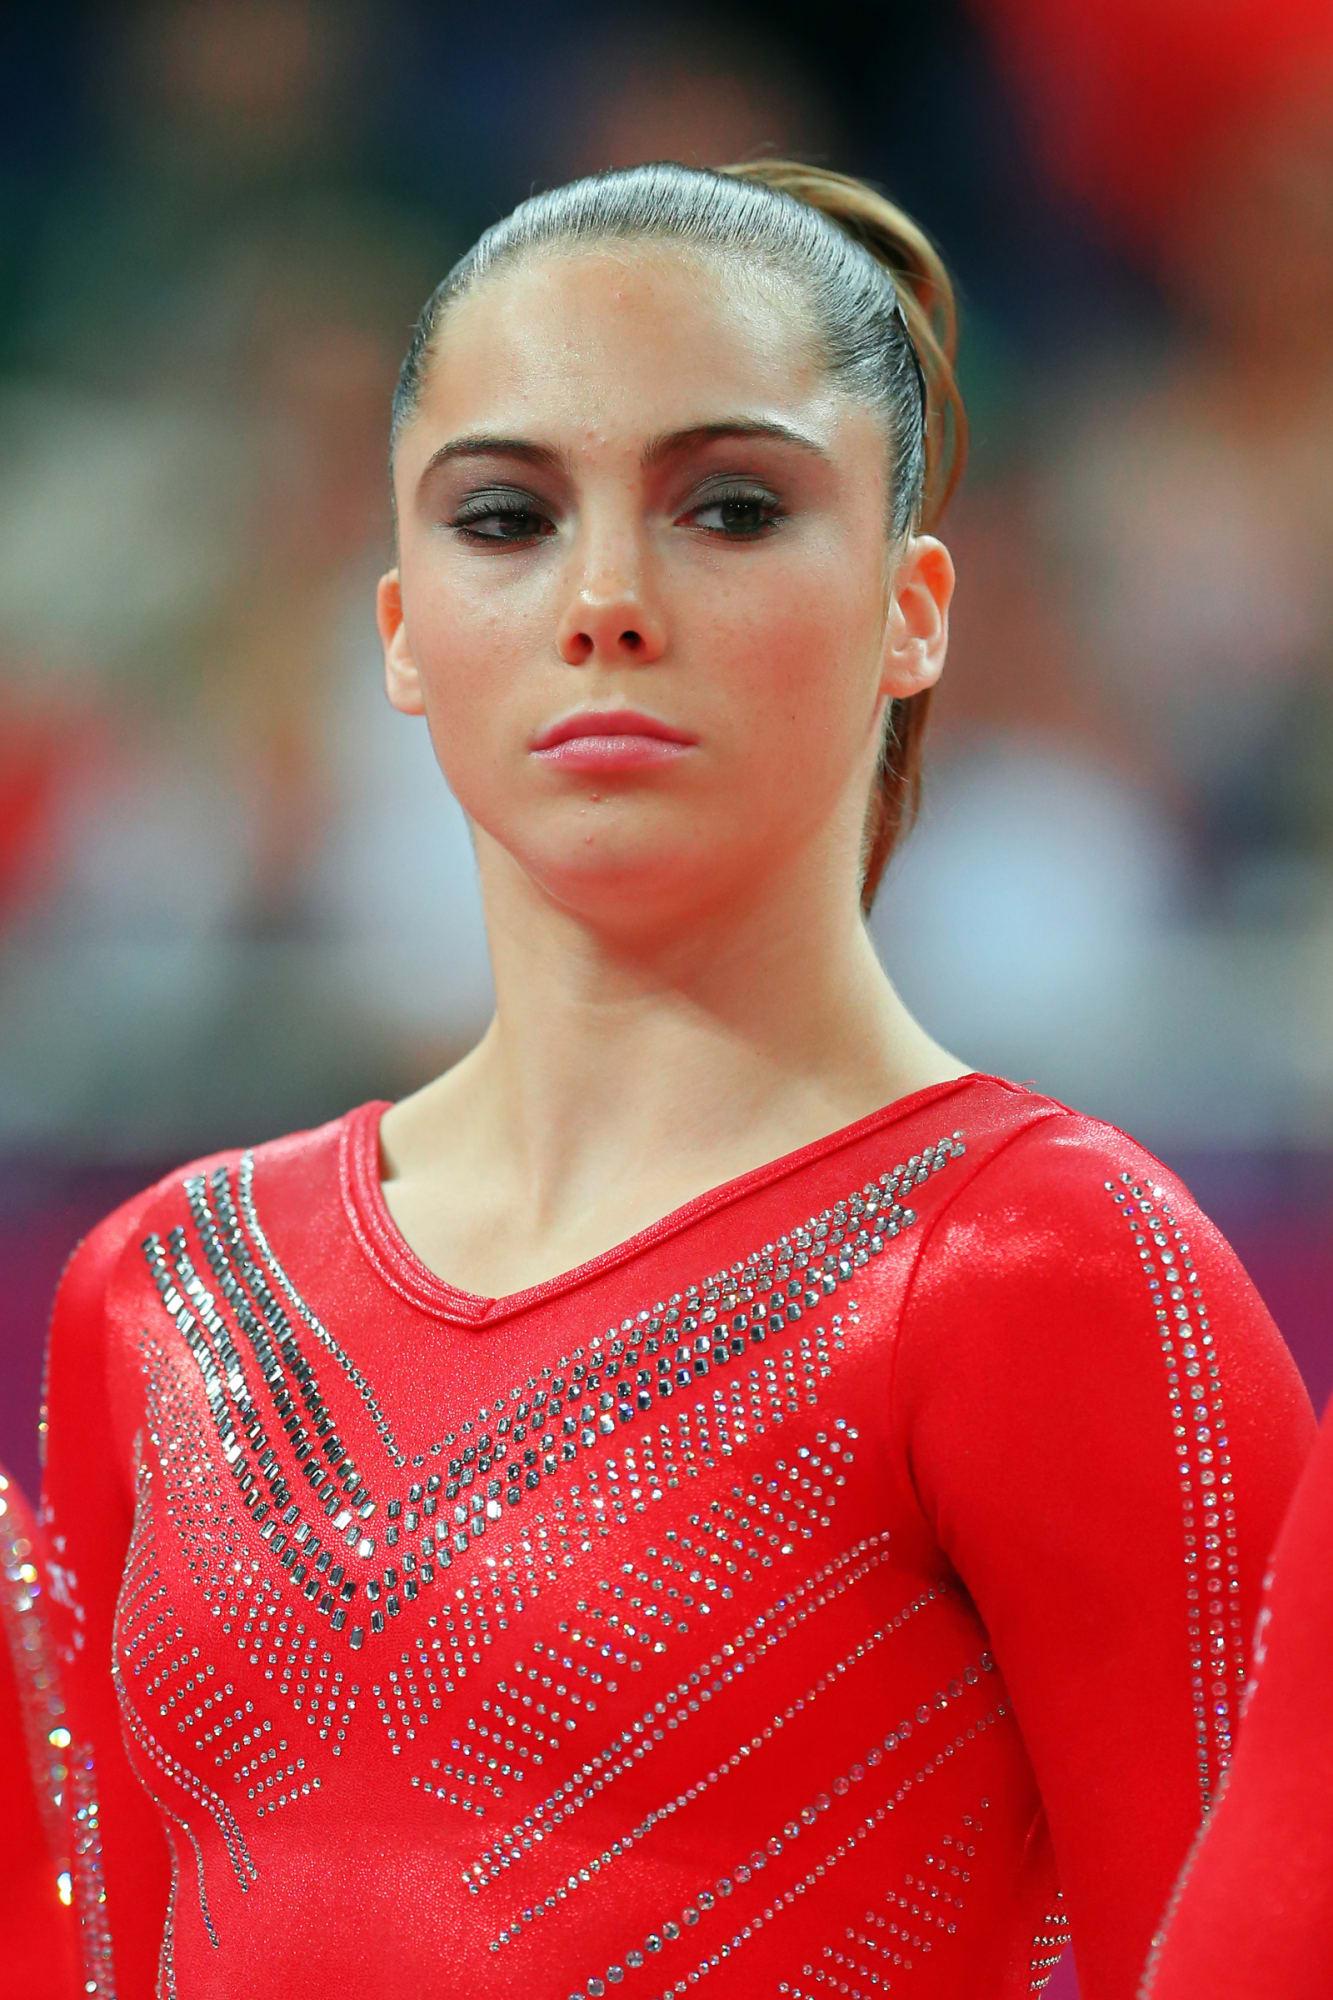 Gymnast McKayla Maroney impresses with upside-down splits in skintight spandex